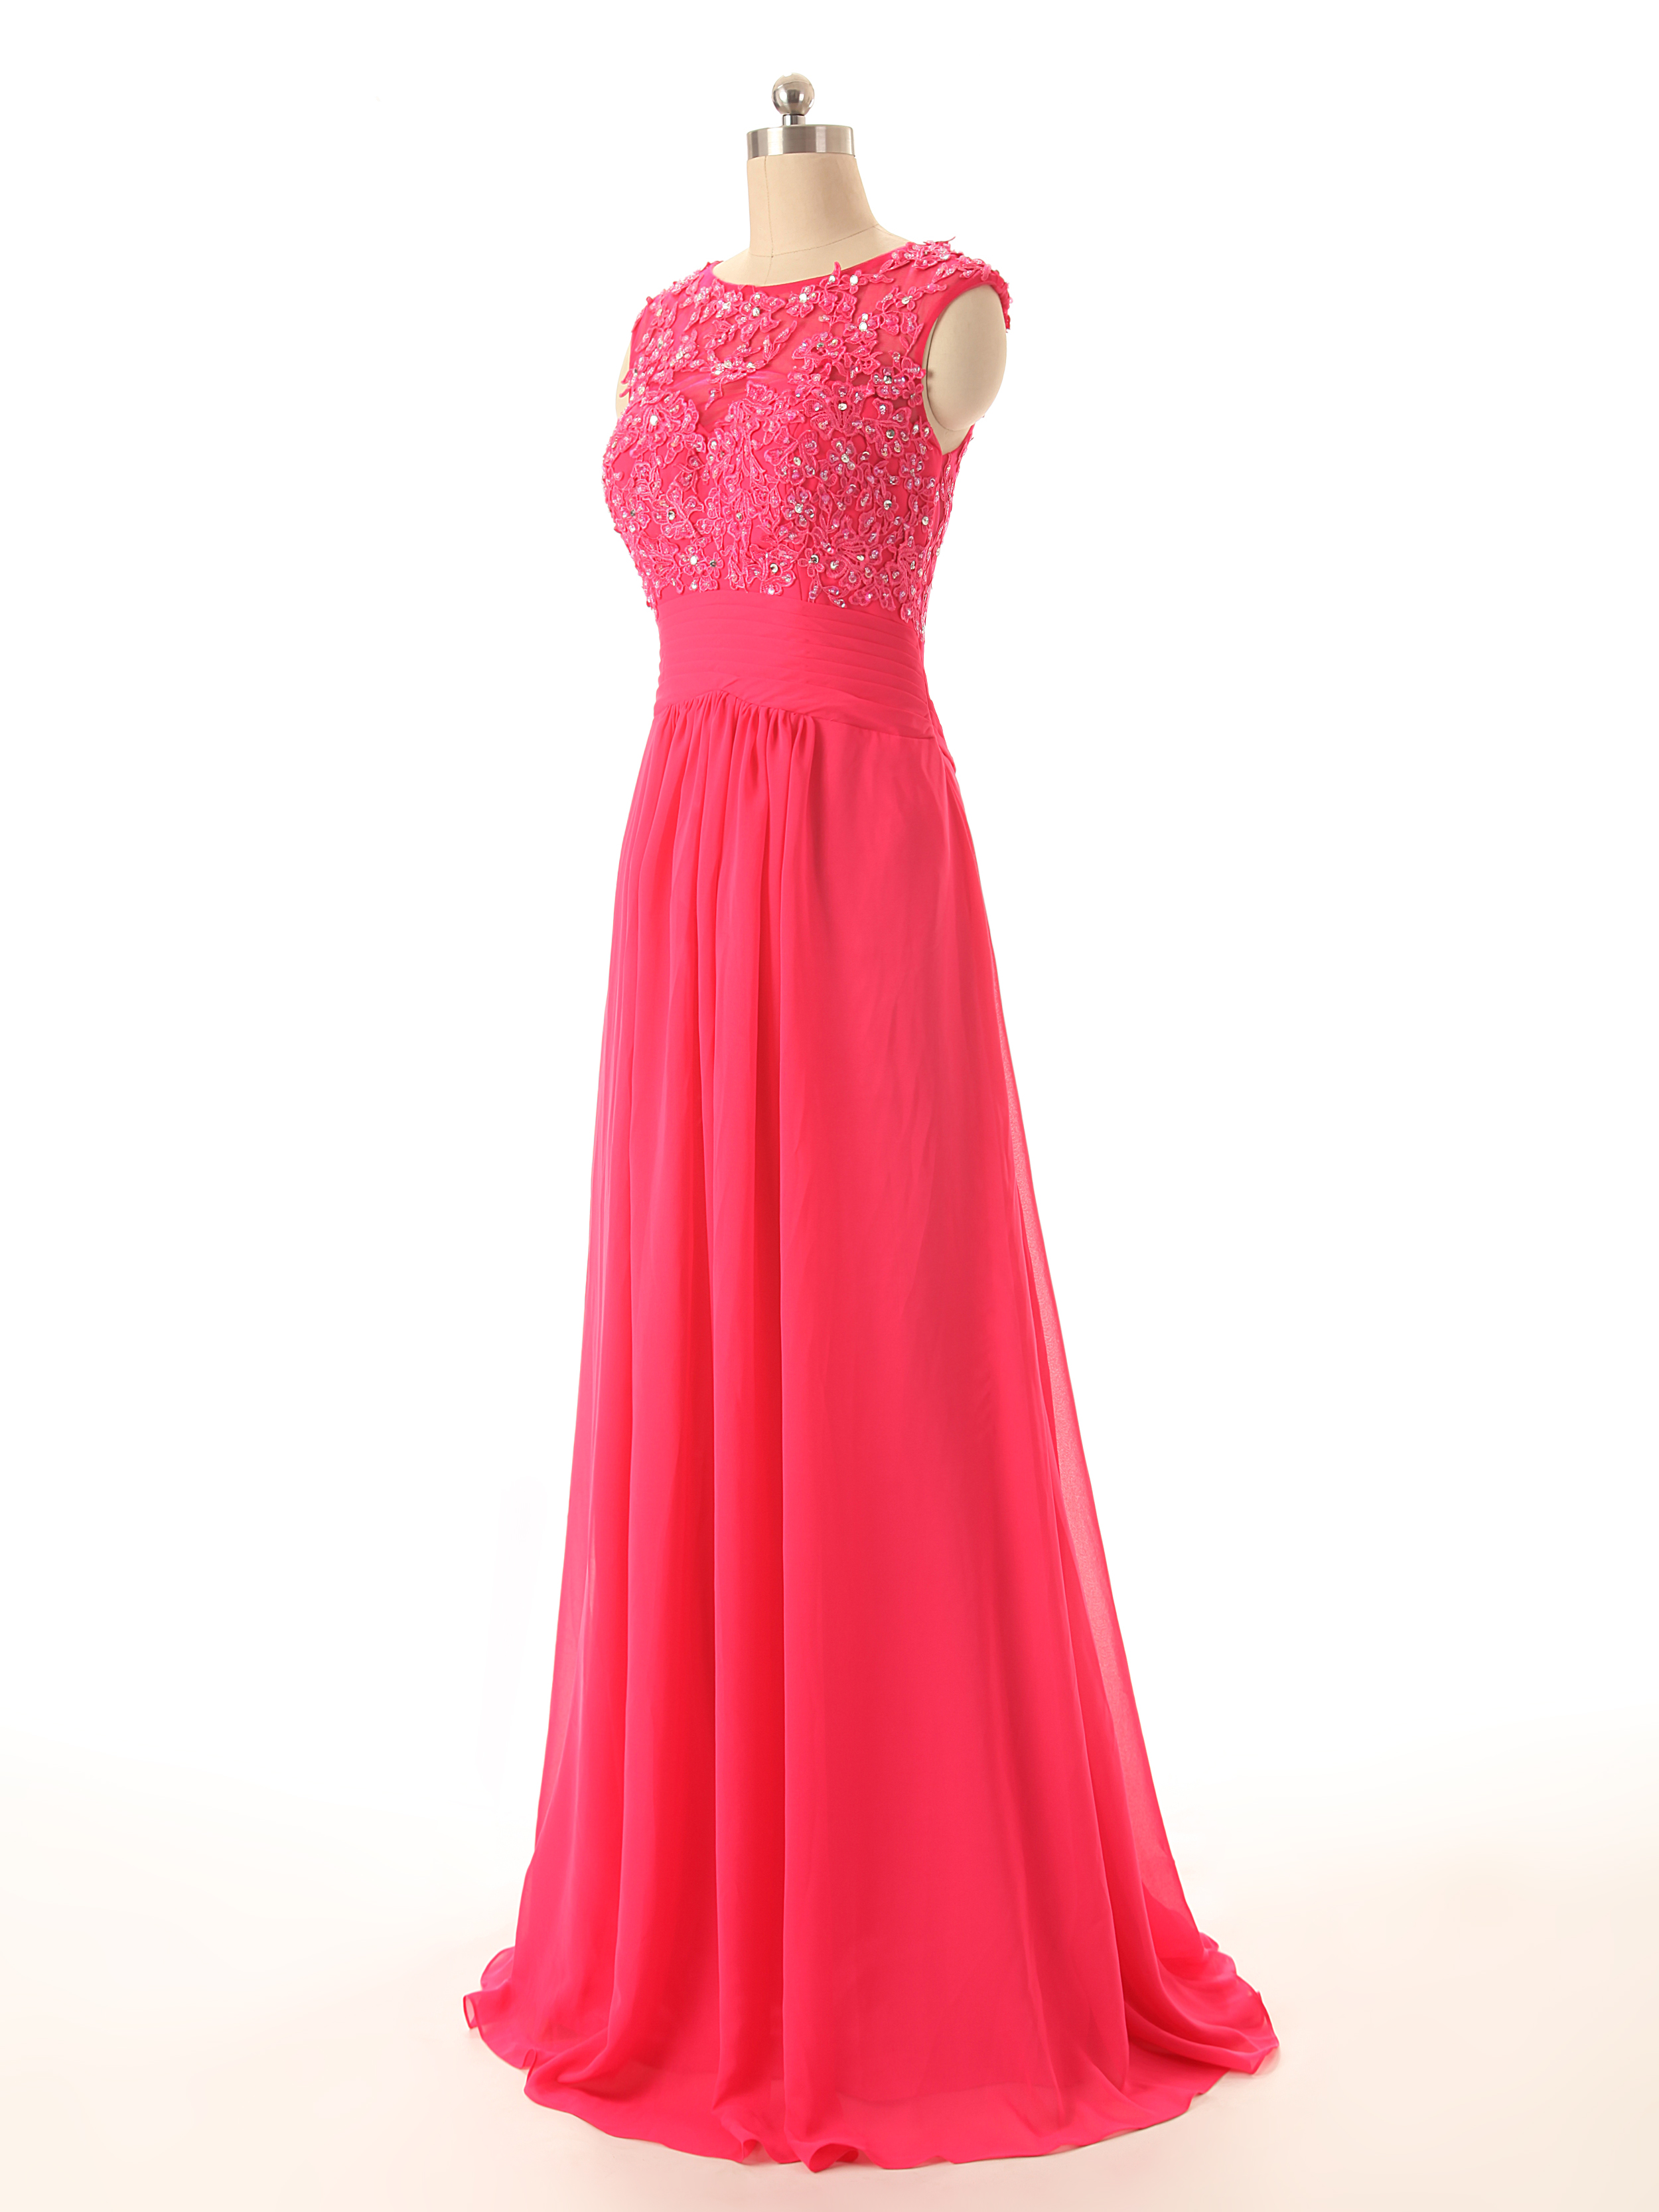 37543658b9 Fashion Dresses.storenvy – DACC